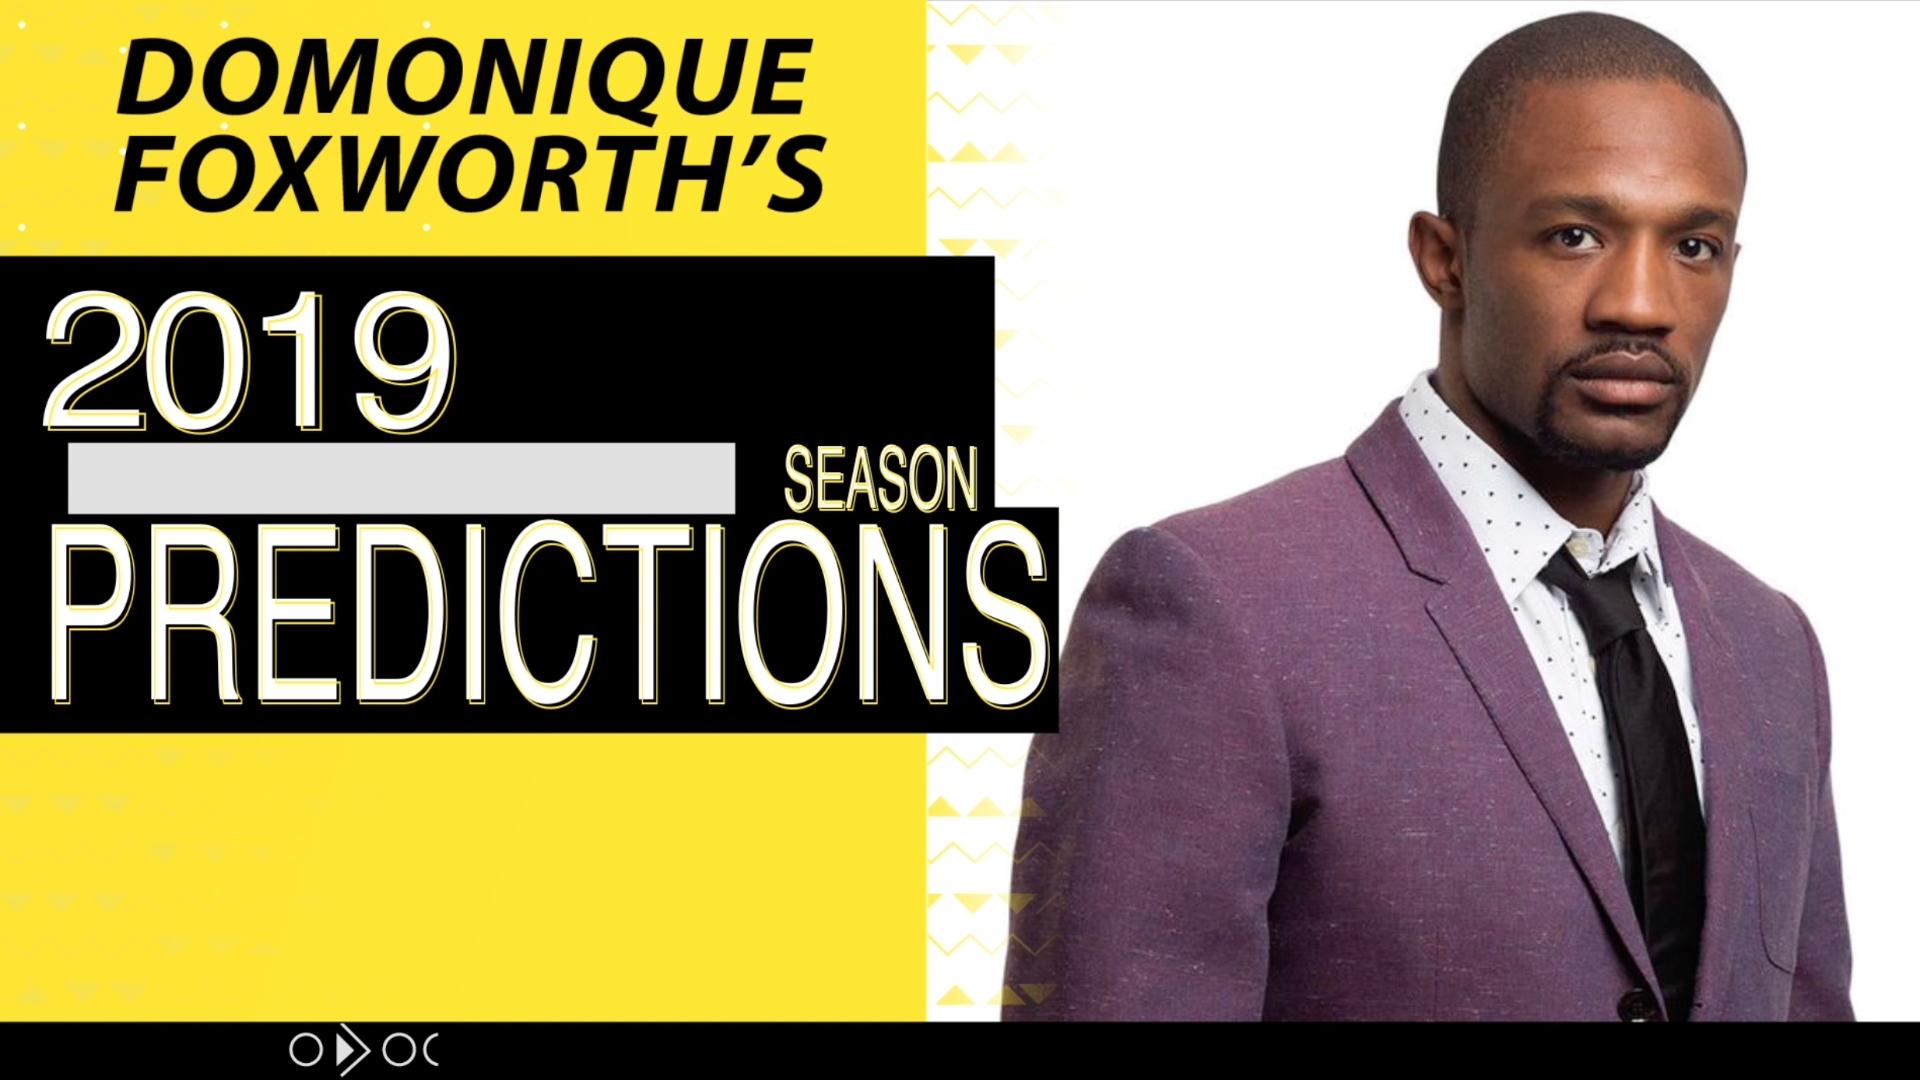 Domonique Foxworth's NFL predictions for the upcoming season